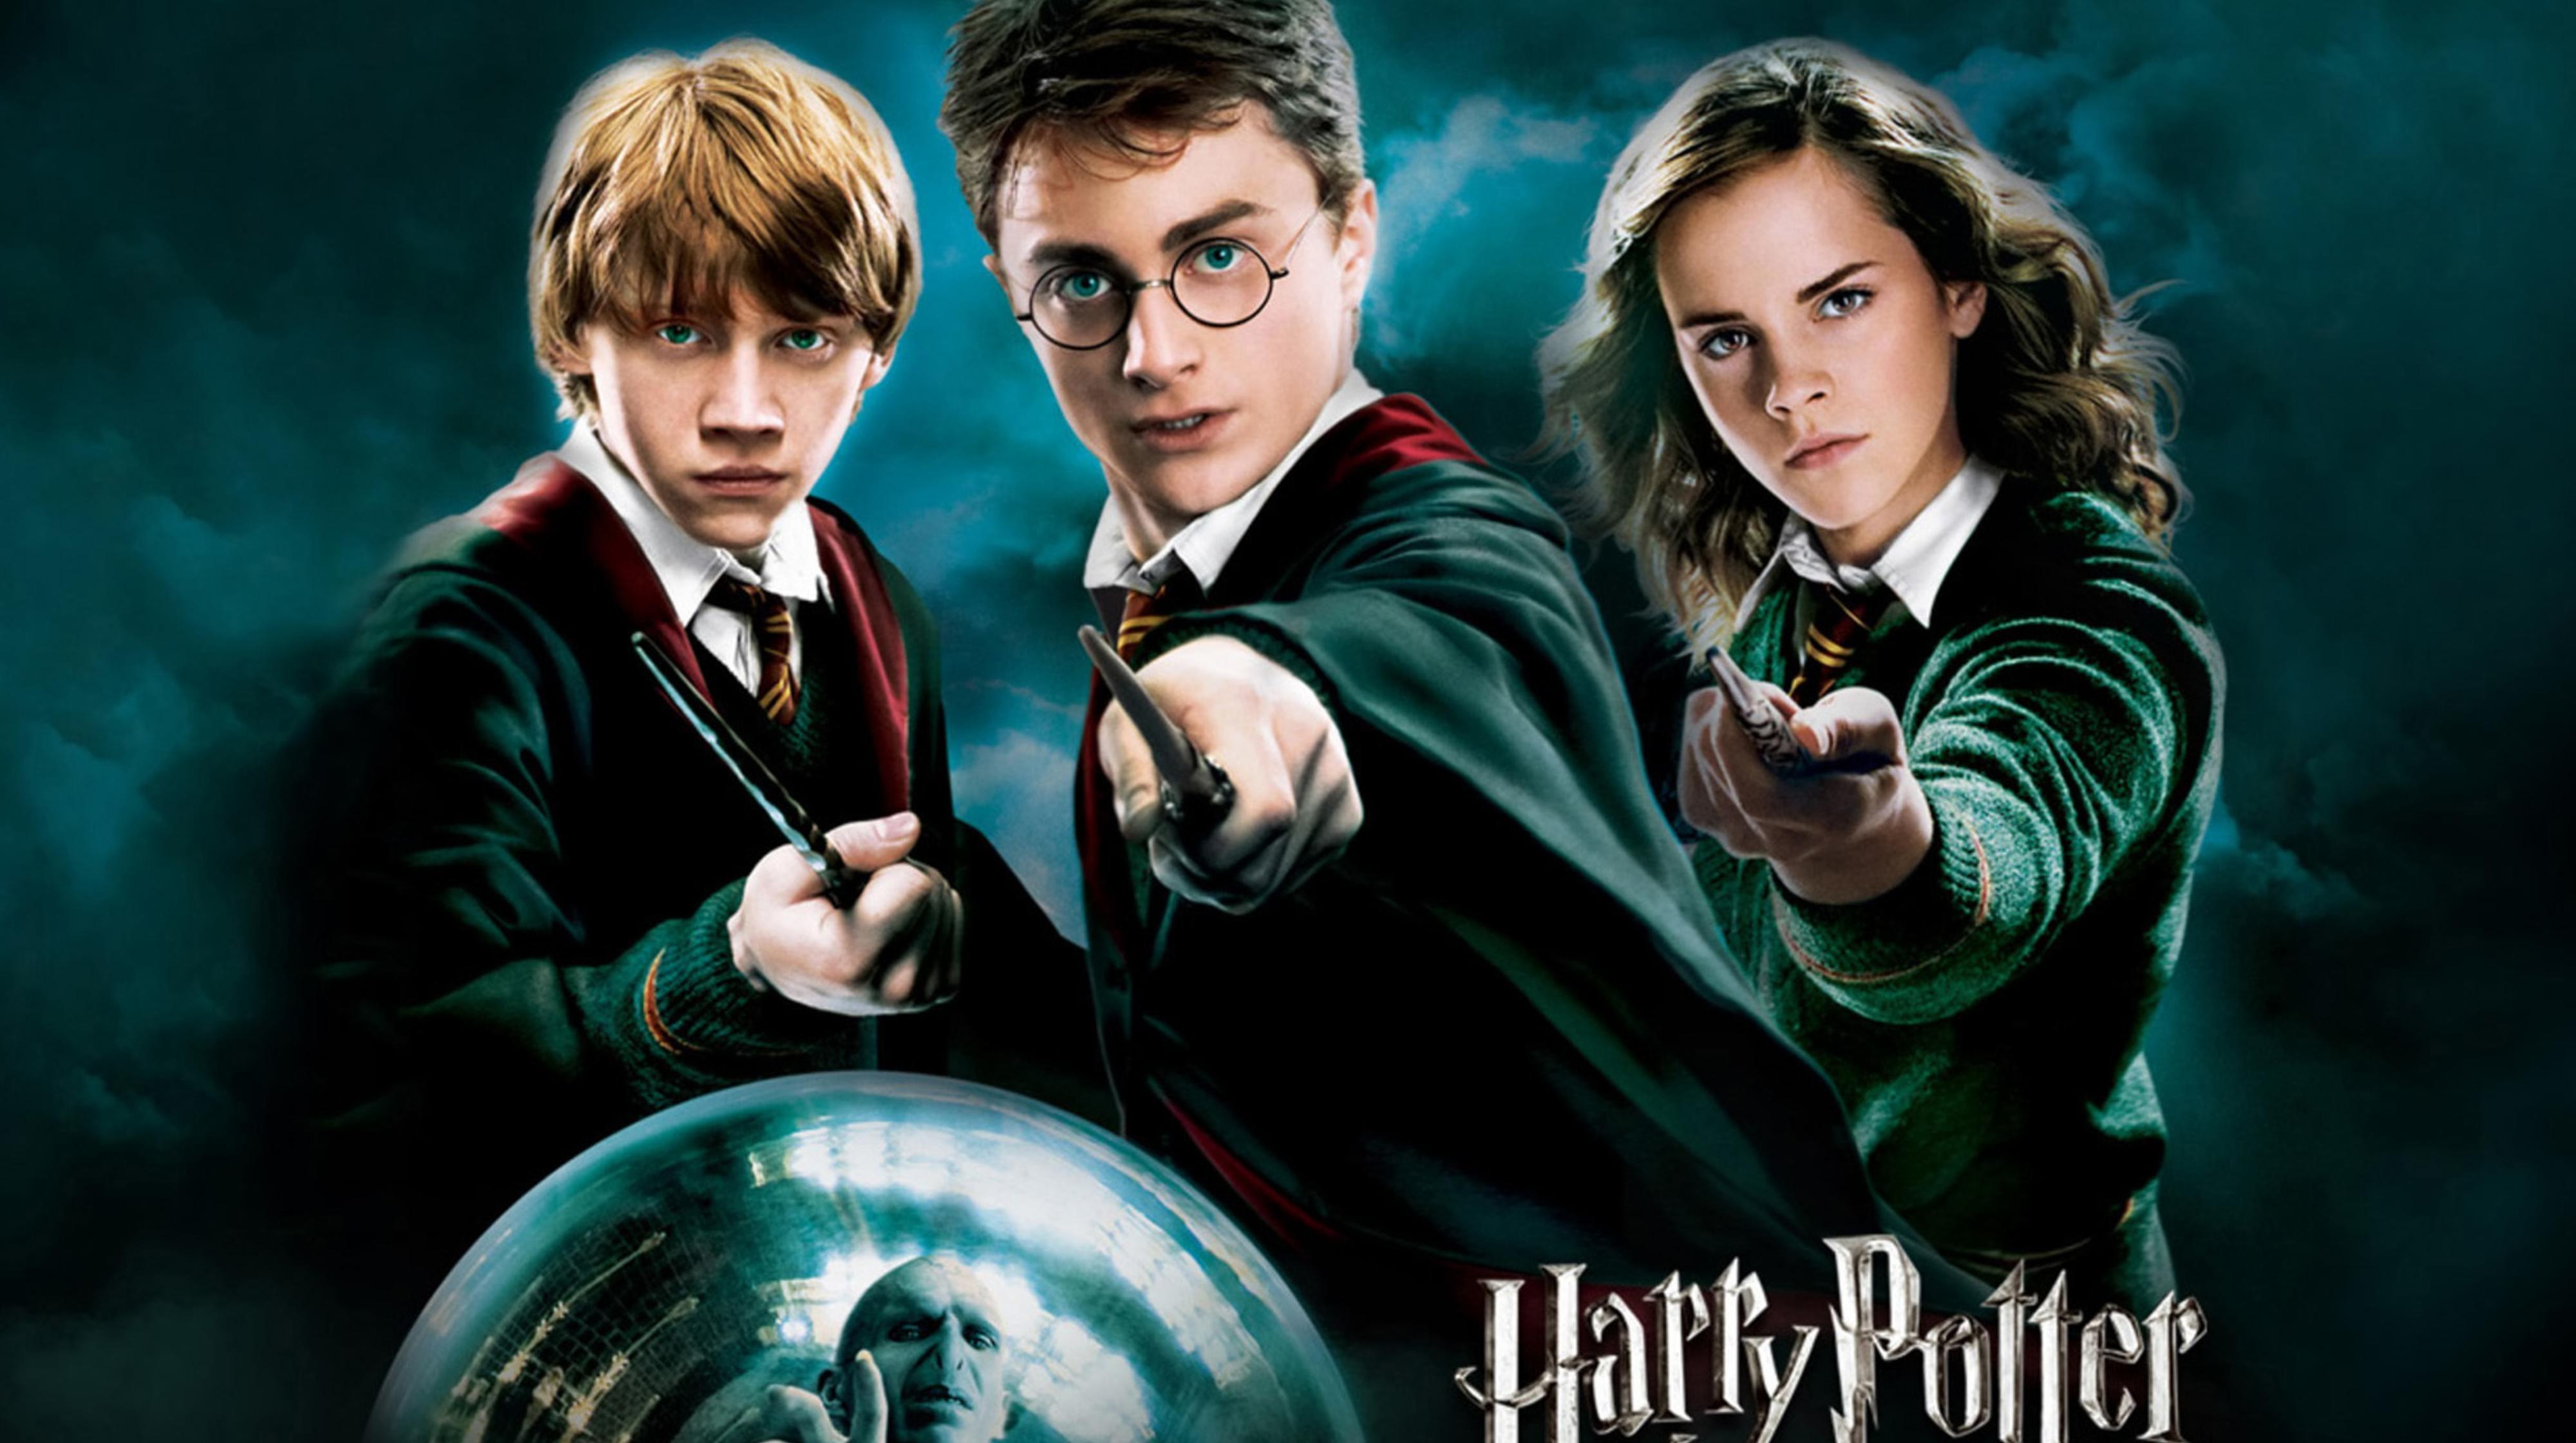 Must see Wallpaper Harry Potter Square - 83c7d8f0e92c33bdb52cfd5ea64ad8cf  Graphic_587444.jpg